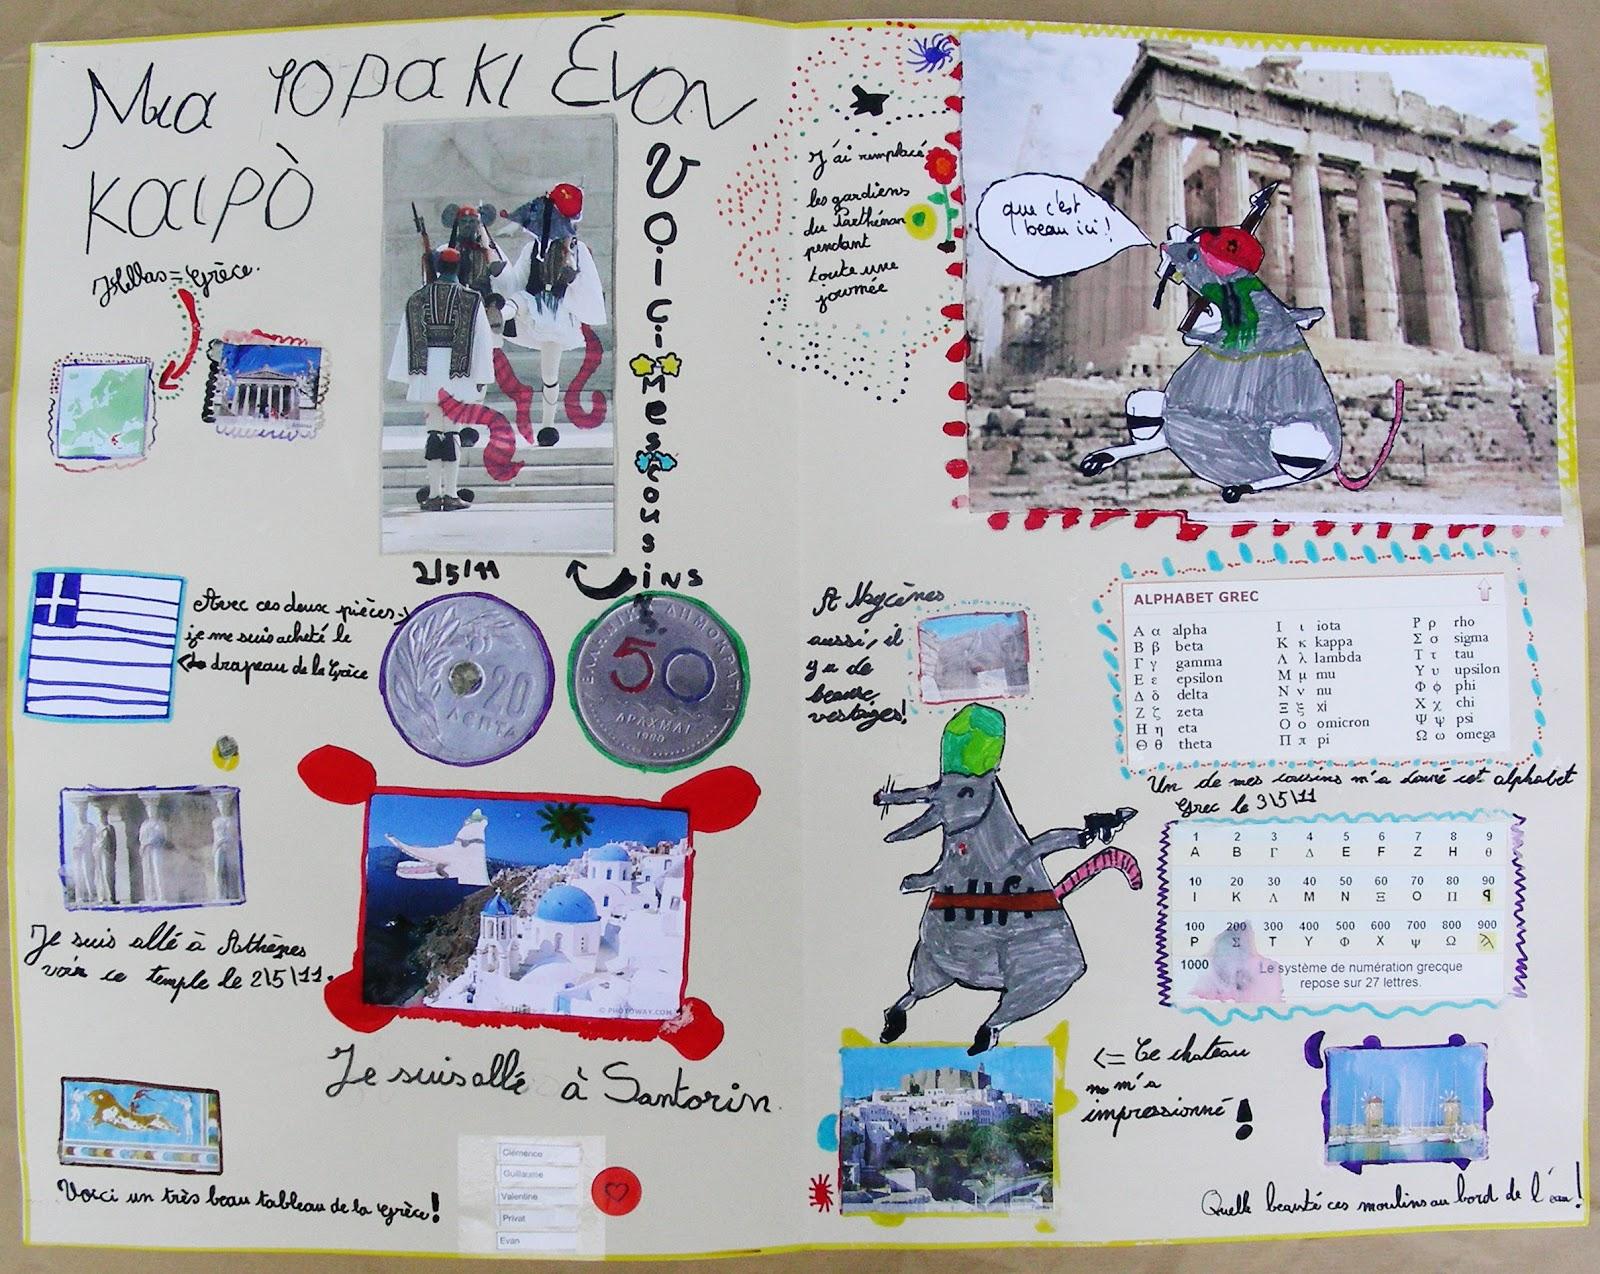 Extrêmement Perrine Boyer - Illustration: Carnets de voyage de Marianito : CM1  DK37